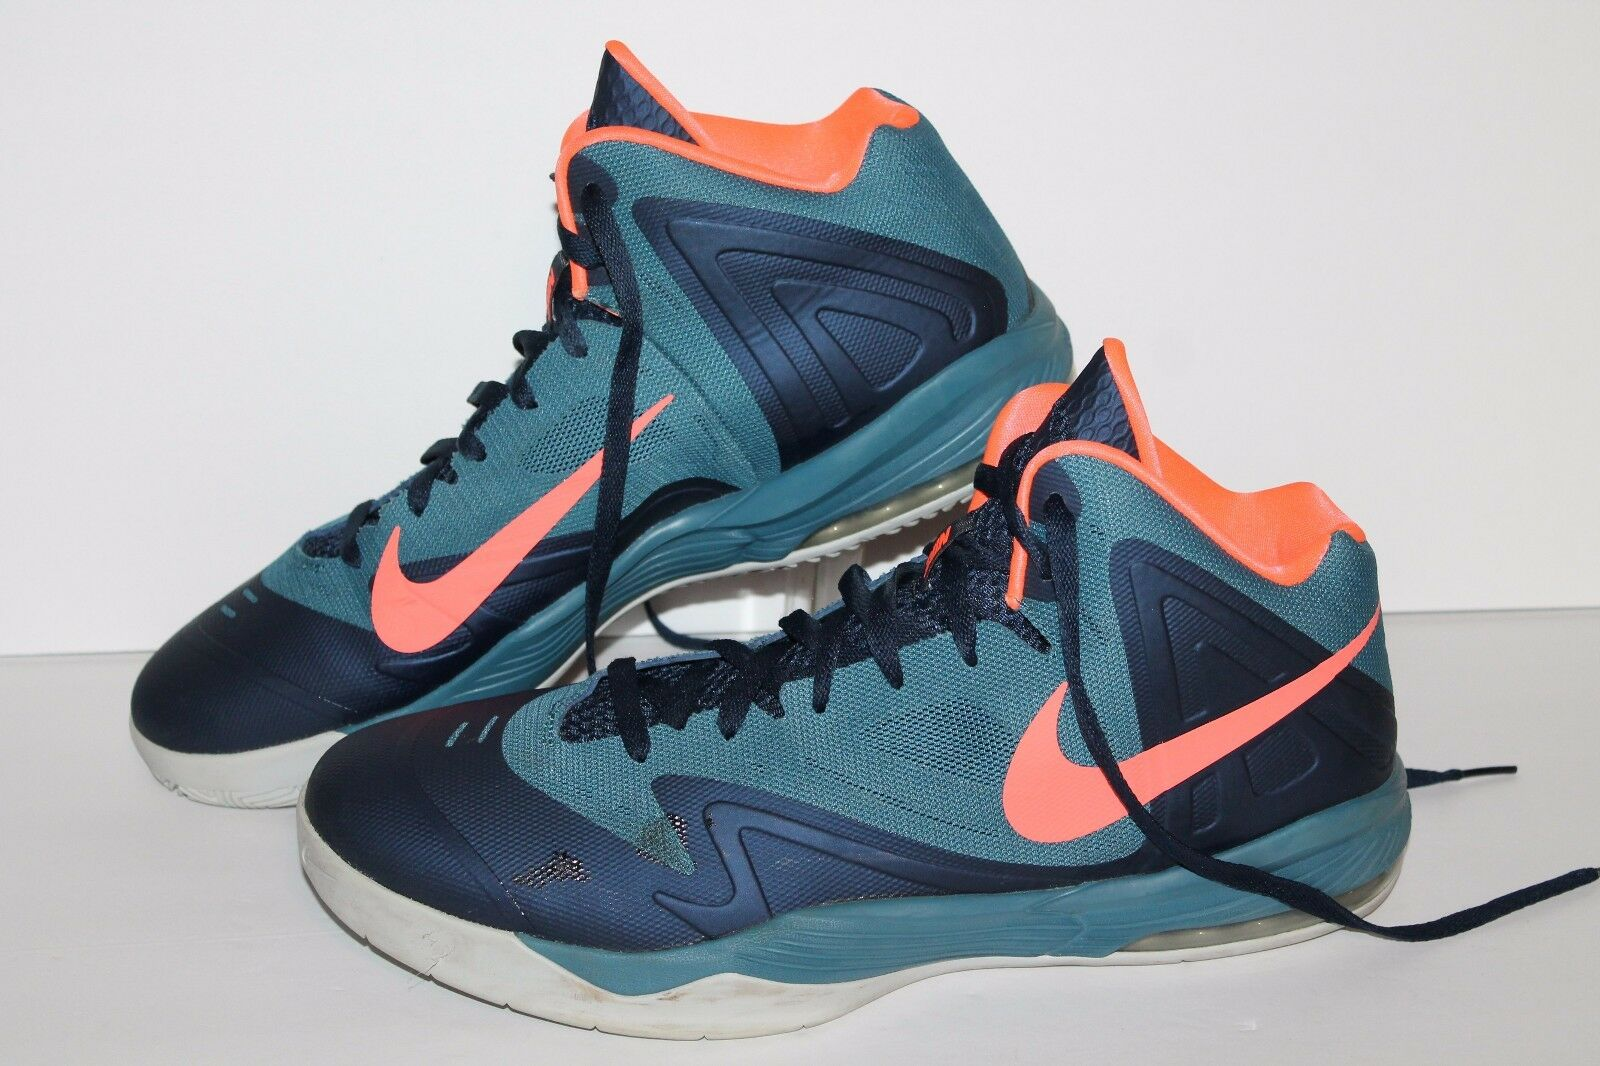 Brand discount Nike Air Max Premiere Basketball Shoes, Navy/Blue/Mango, Men's 14